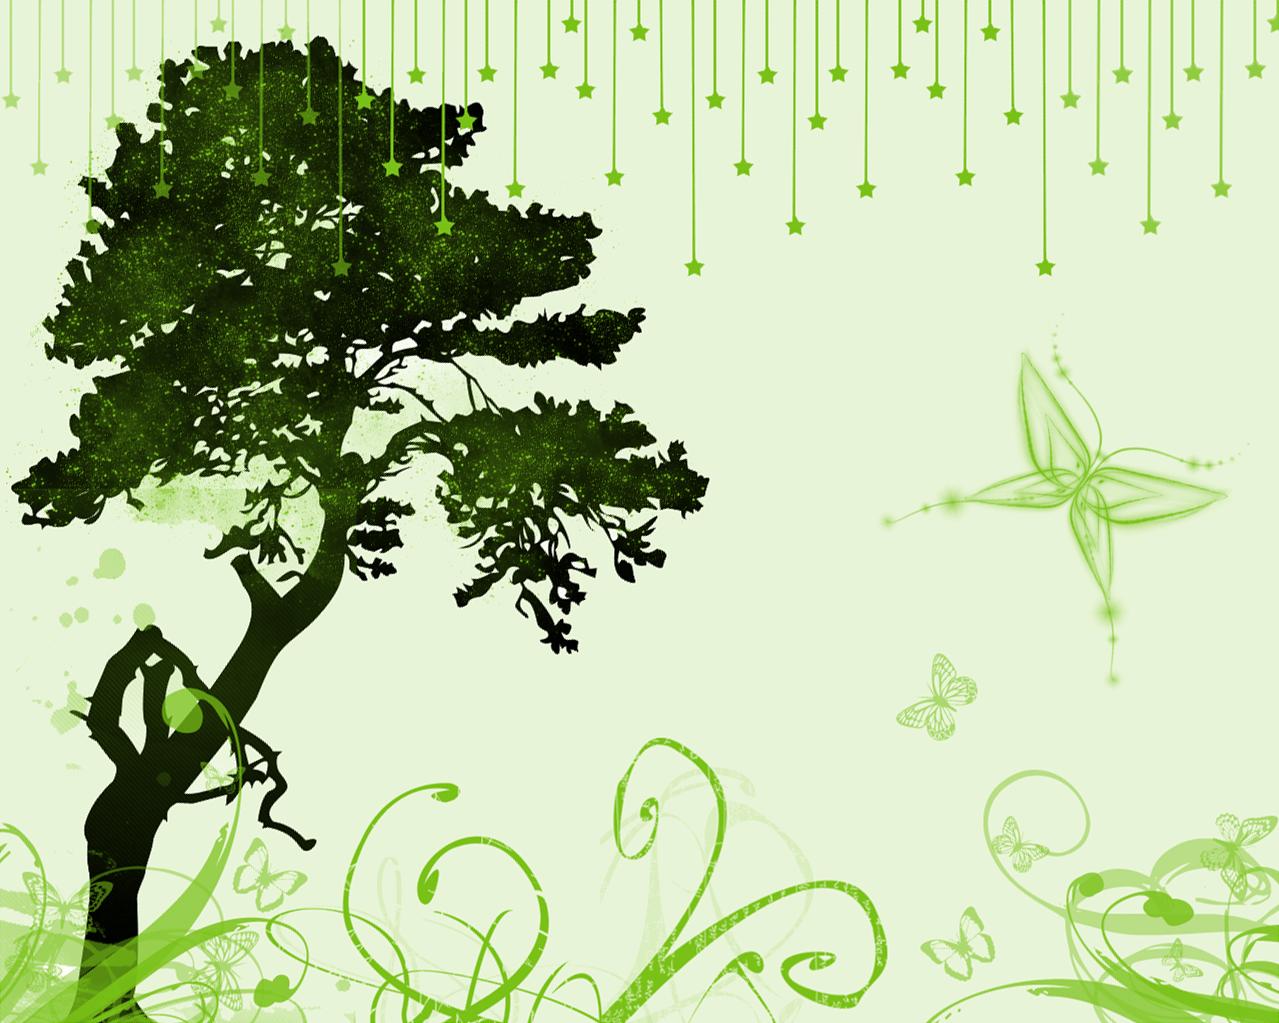 http://1.bp.blogspot.com/_BcpesiMRdPU/TDh_5QfN7eI/AAAAAAAAAfA/PwF9fAOFvuU/s1600/digo.ws_green_wallpapers_0048.png